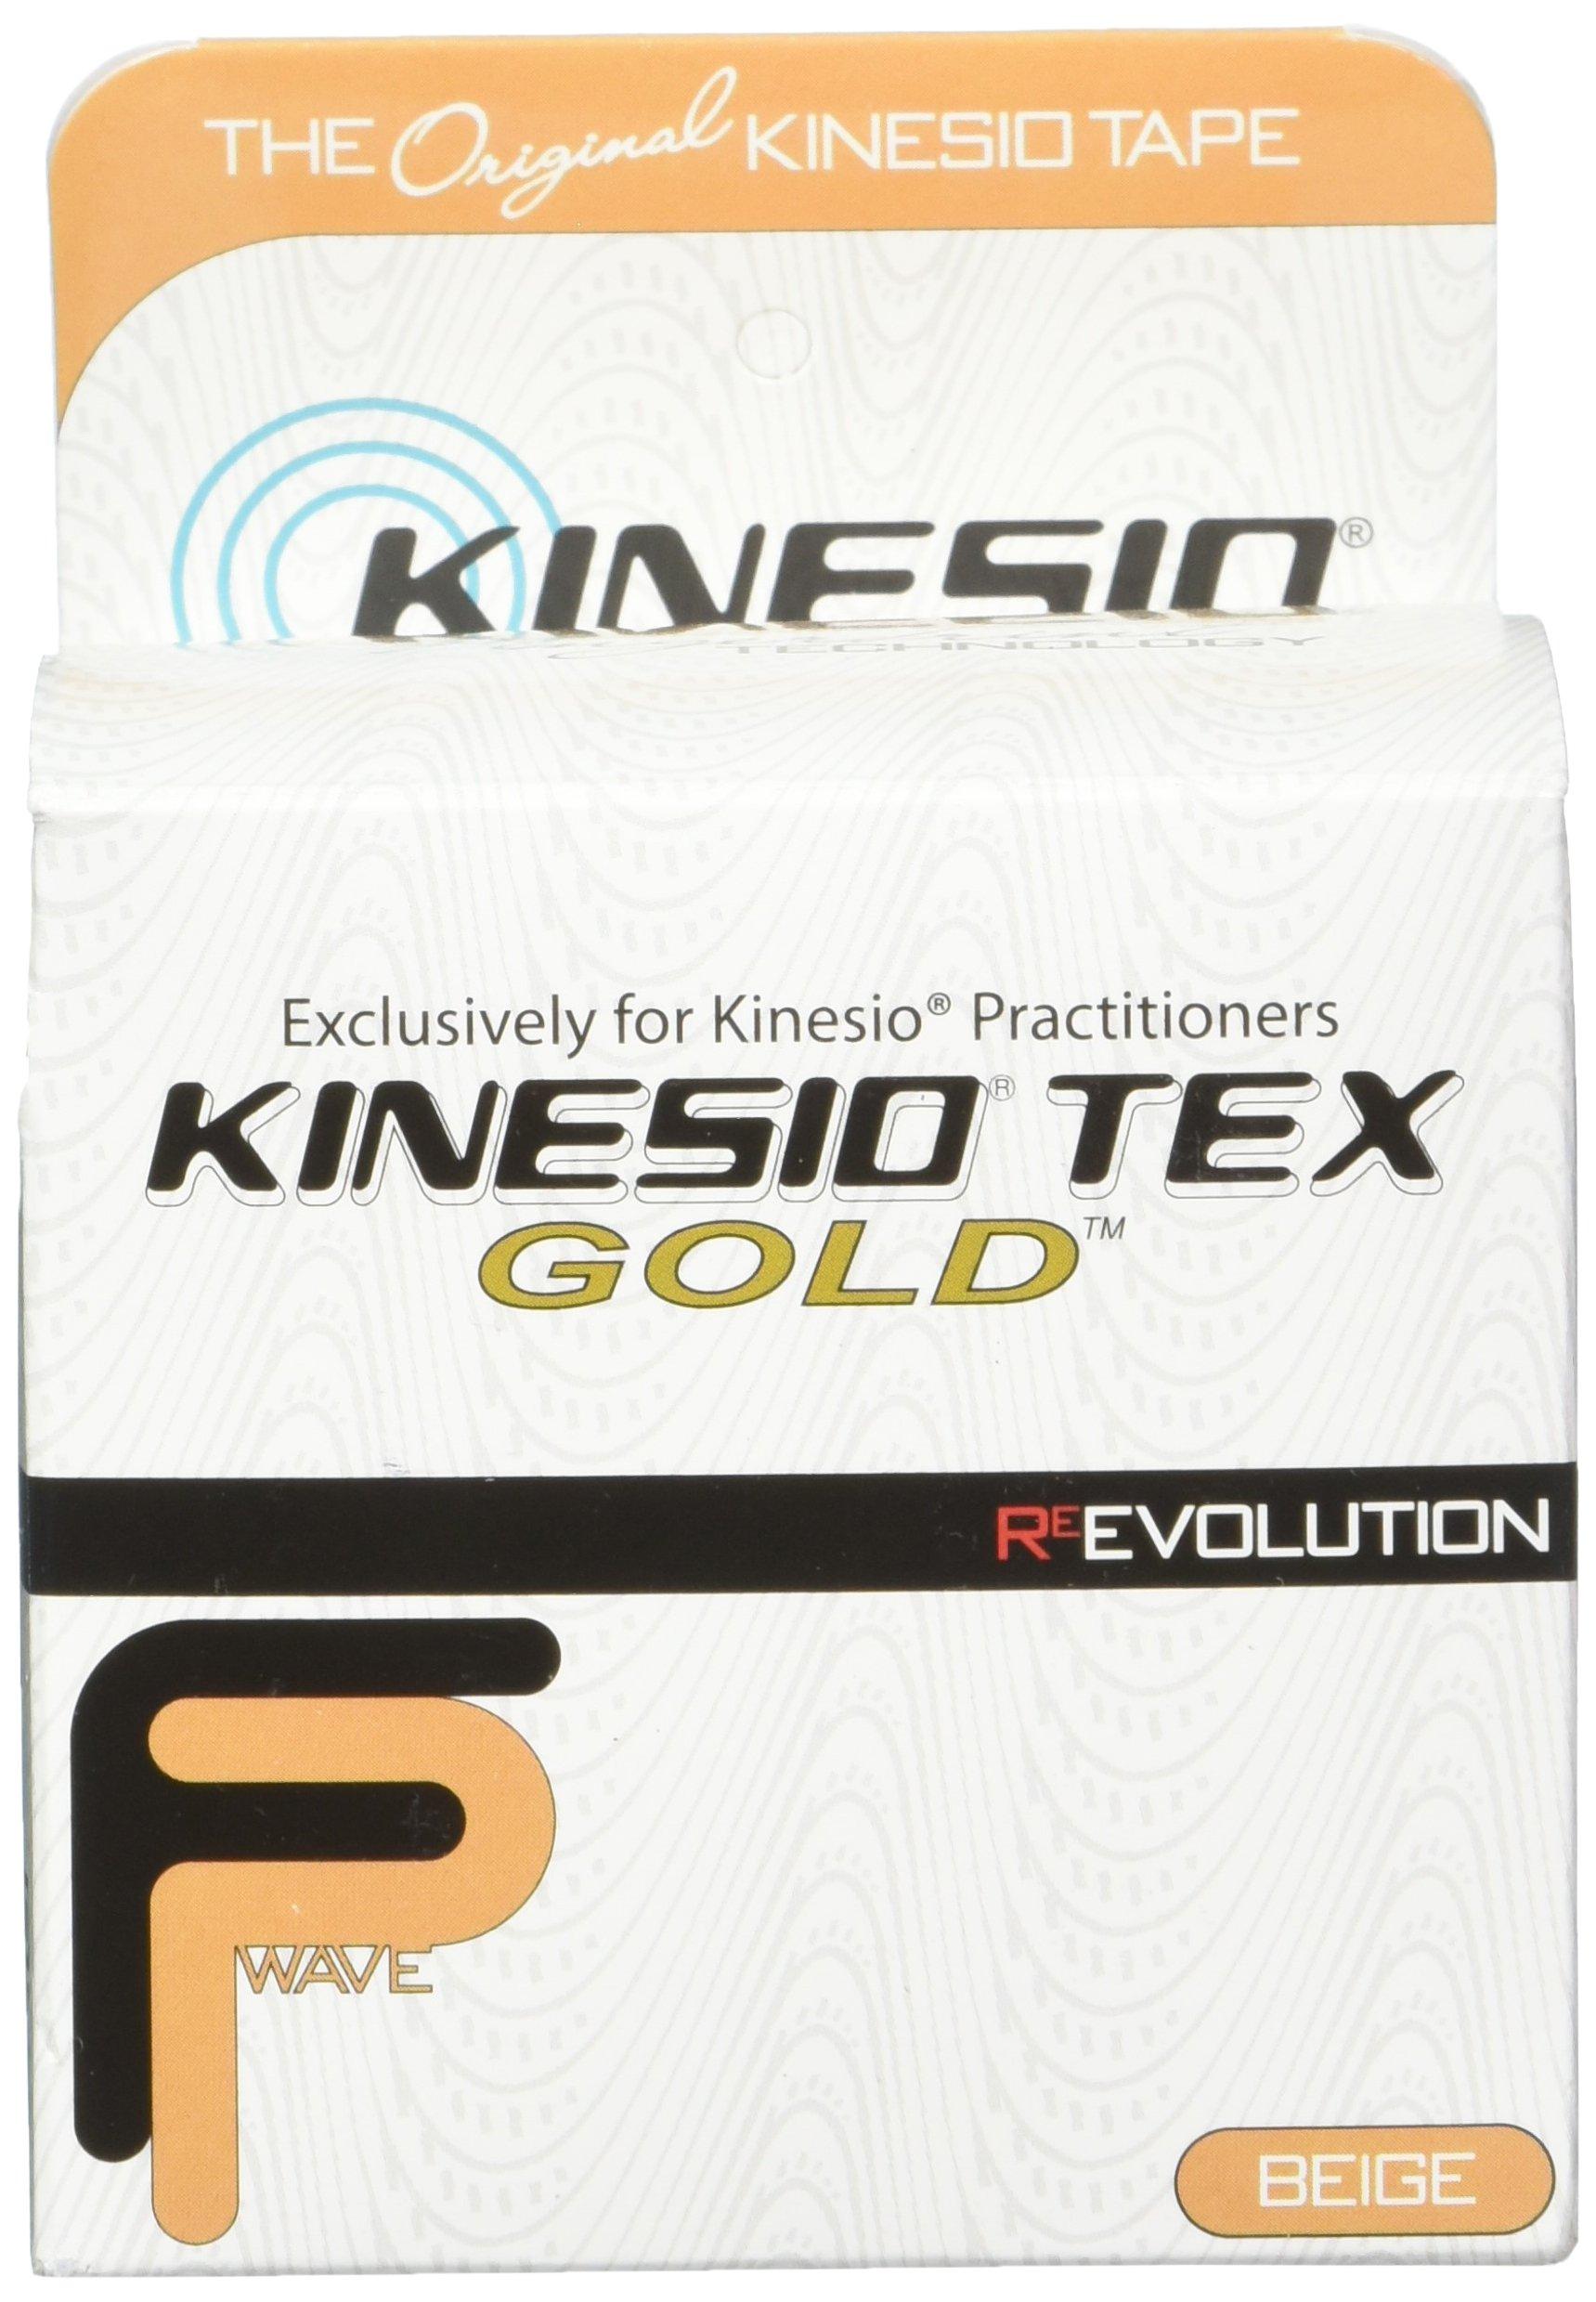 "Kinesio Tex Gold FP 3"" x 16.4', Beige, Single Roll"